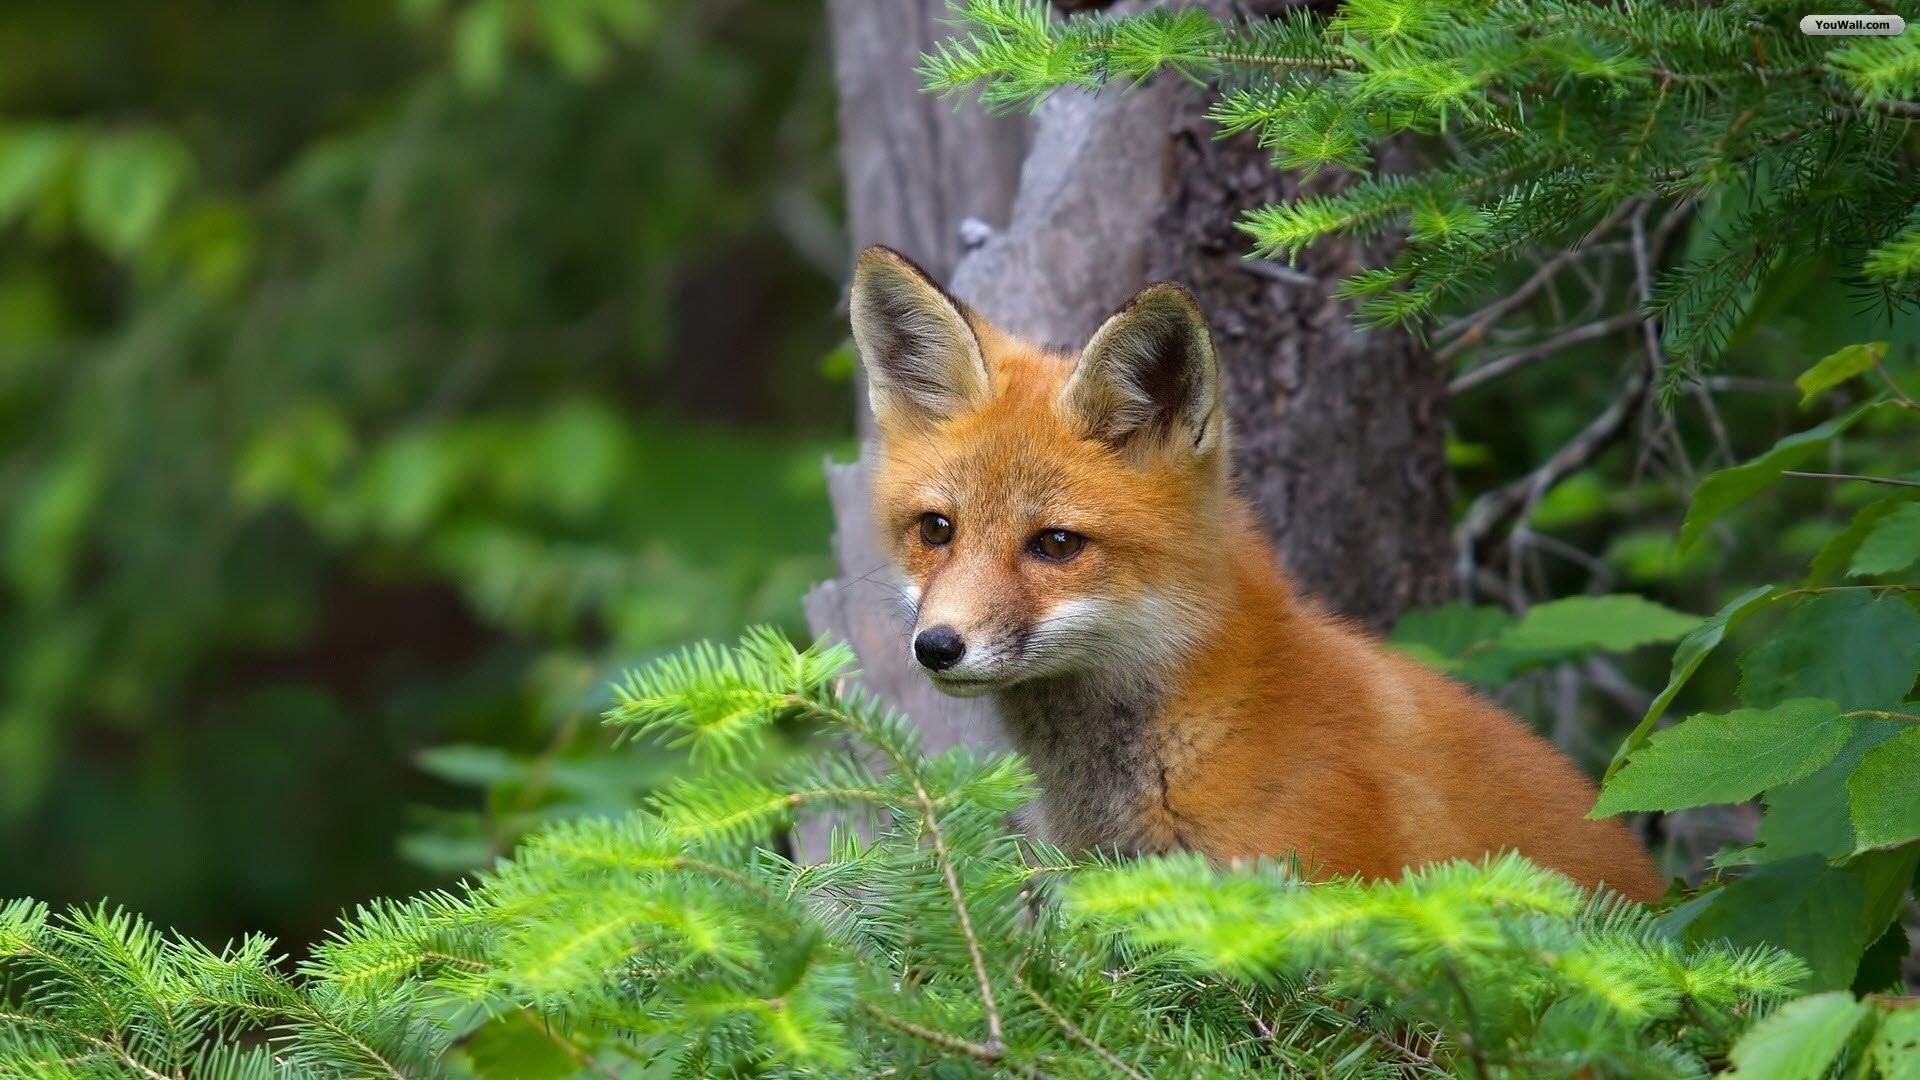 YouWall – Cute Red Fox Wallpaper – wallpaper,wallpapers,free wallpaper .